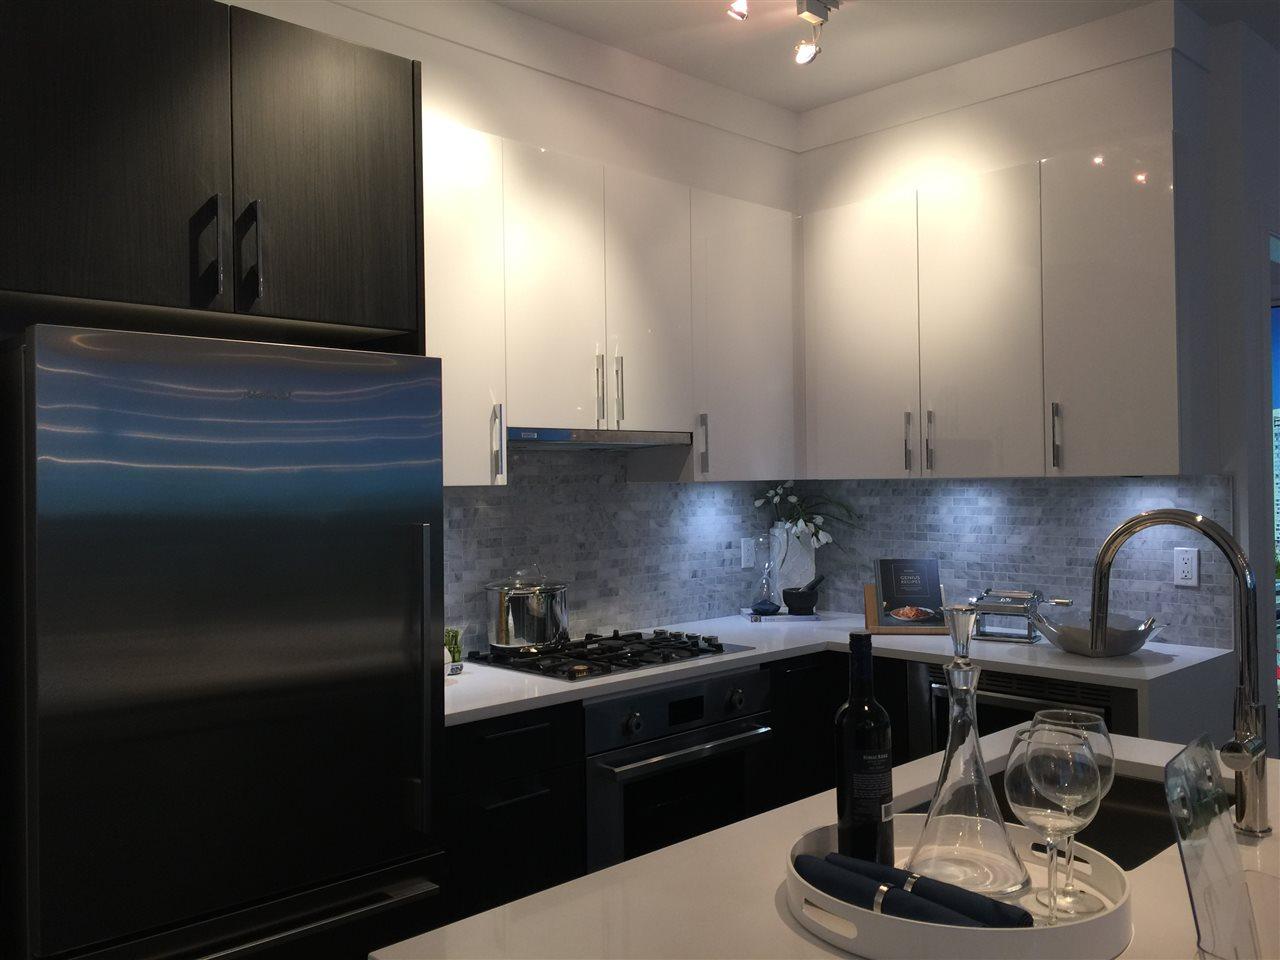 Condo Apartment at 1407 518 WHITING WAY, Unit 1407, Coquitlam, British Columbia. Image 6